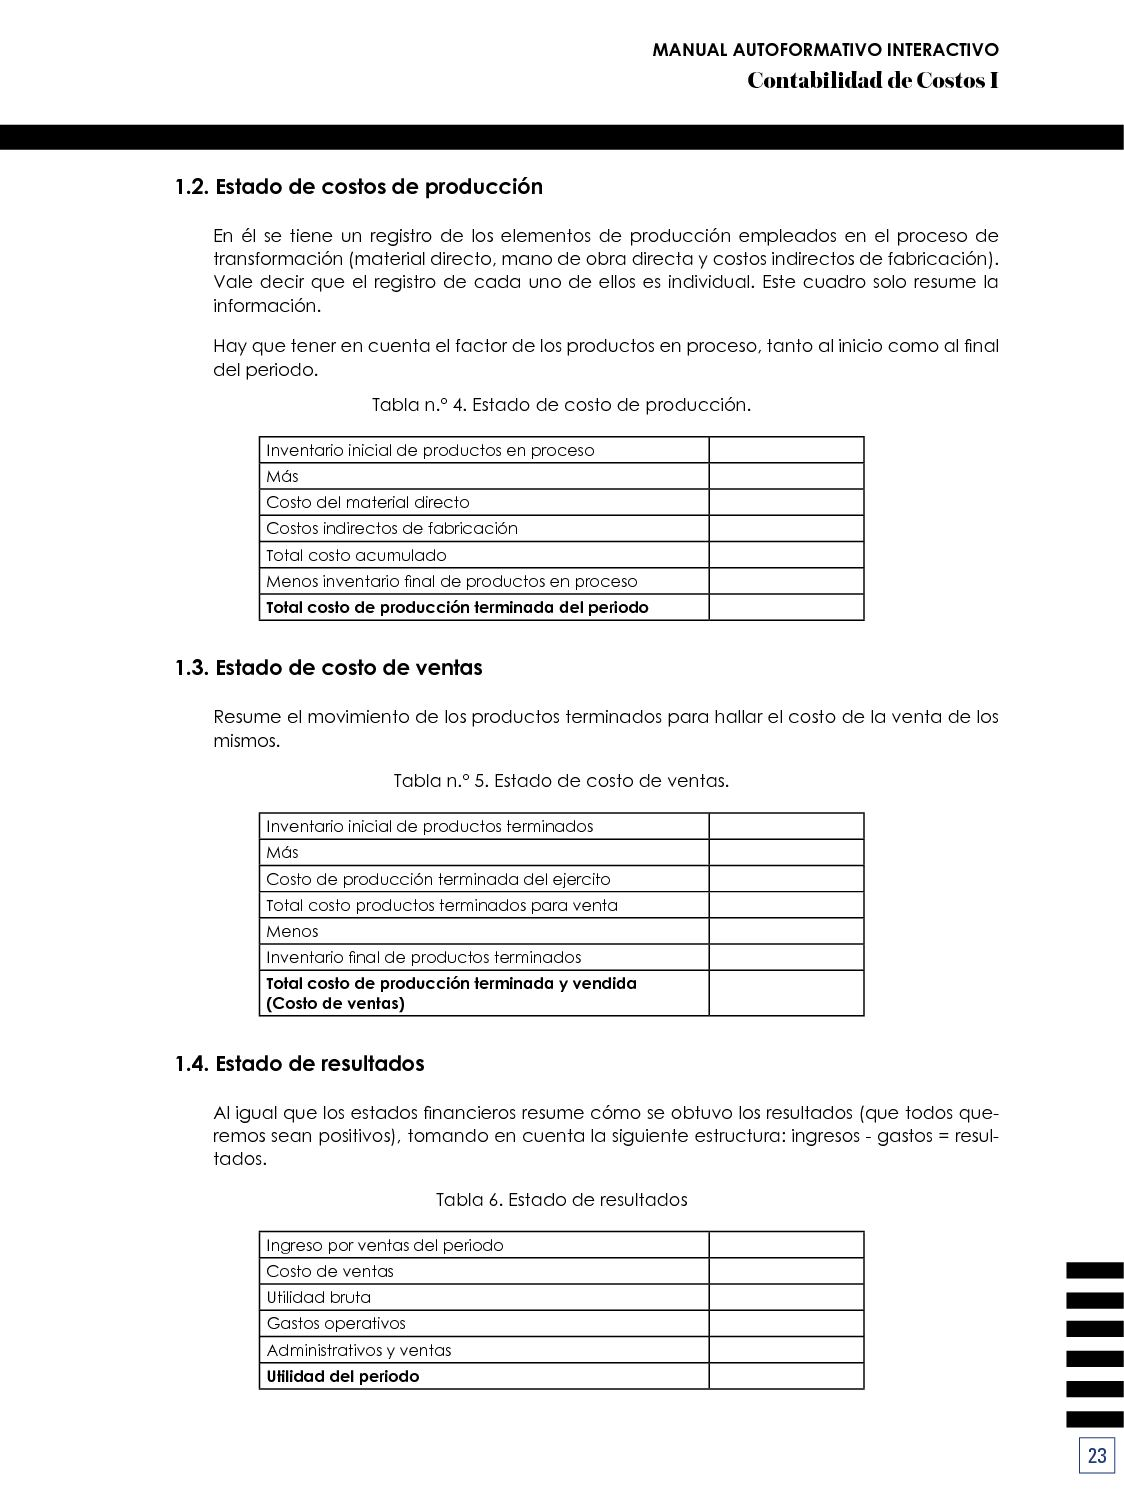 Contabilidad De Costos I Uc0131 - CALAMEO Downloader